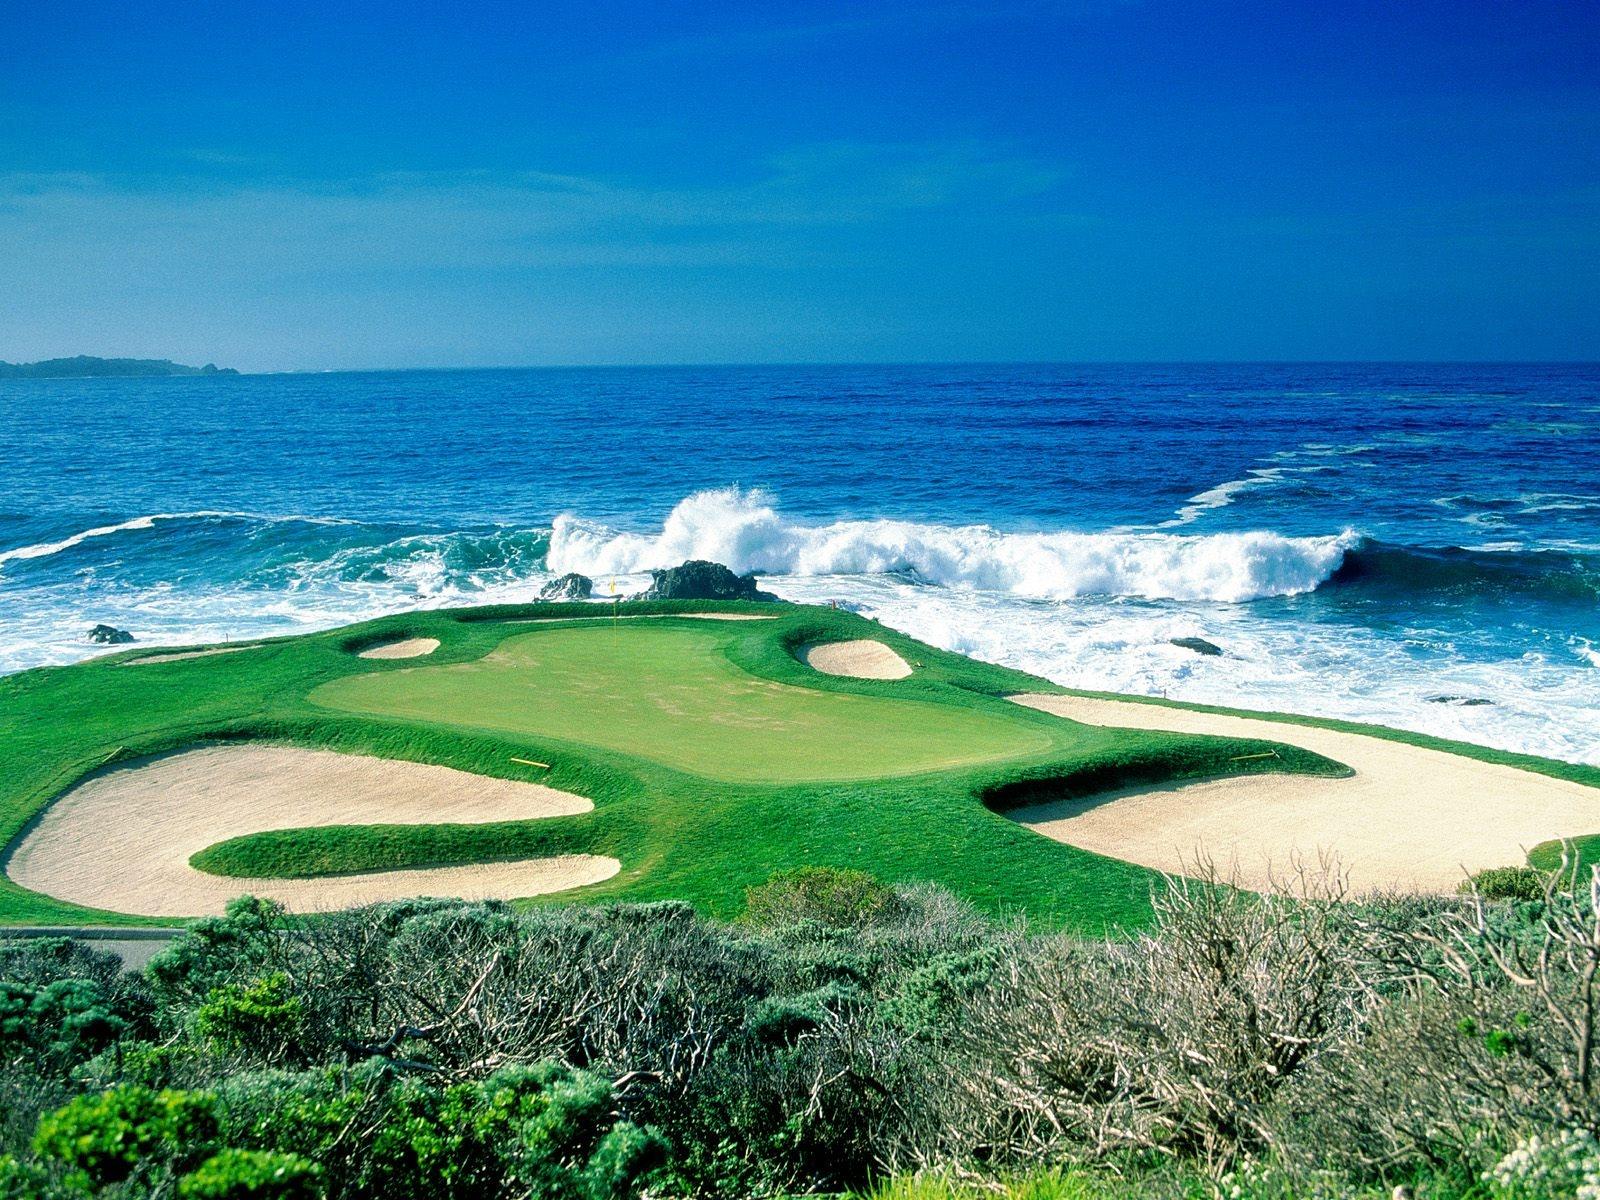 Stunning Golf Fields Landscapes HD Wallpaper Download Wallpapers 1600x1200